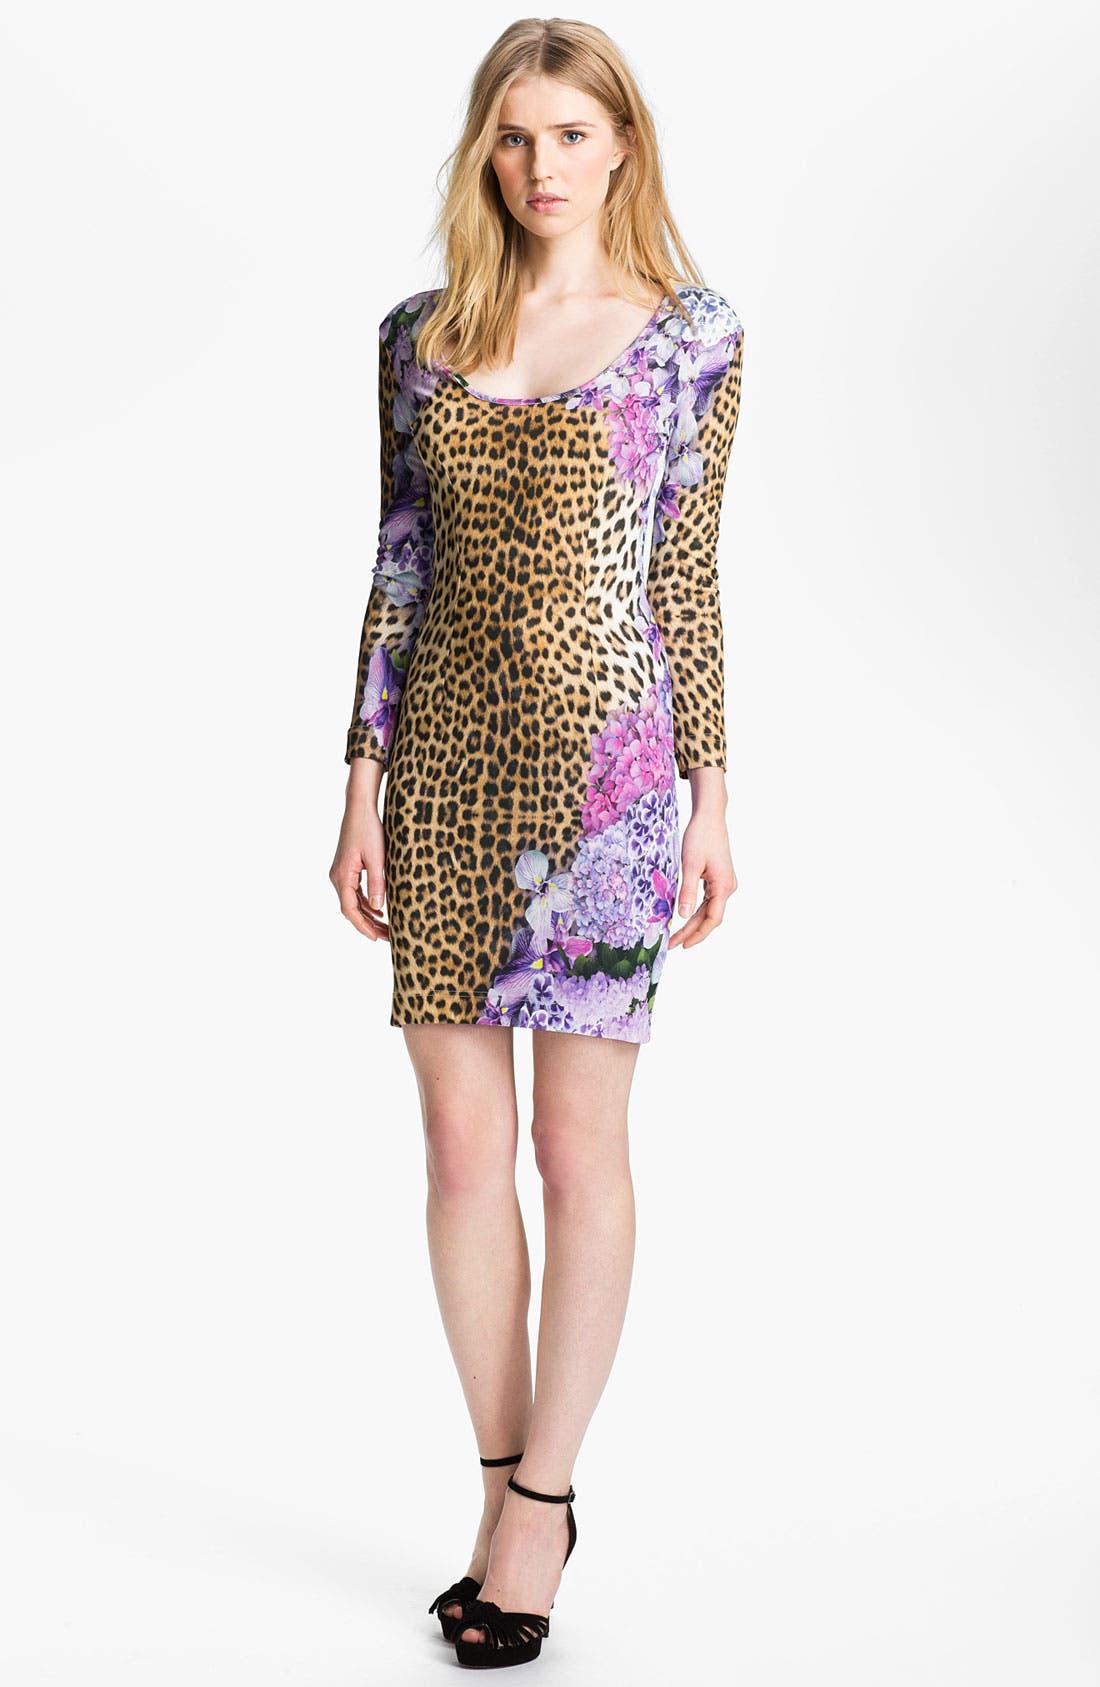 Alternate Image 1 Selected - Just Cavalli Leopard & Floral Print Jersey Dress